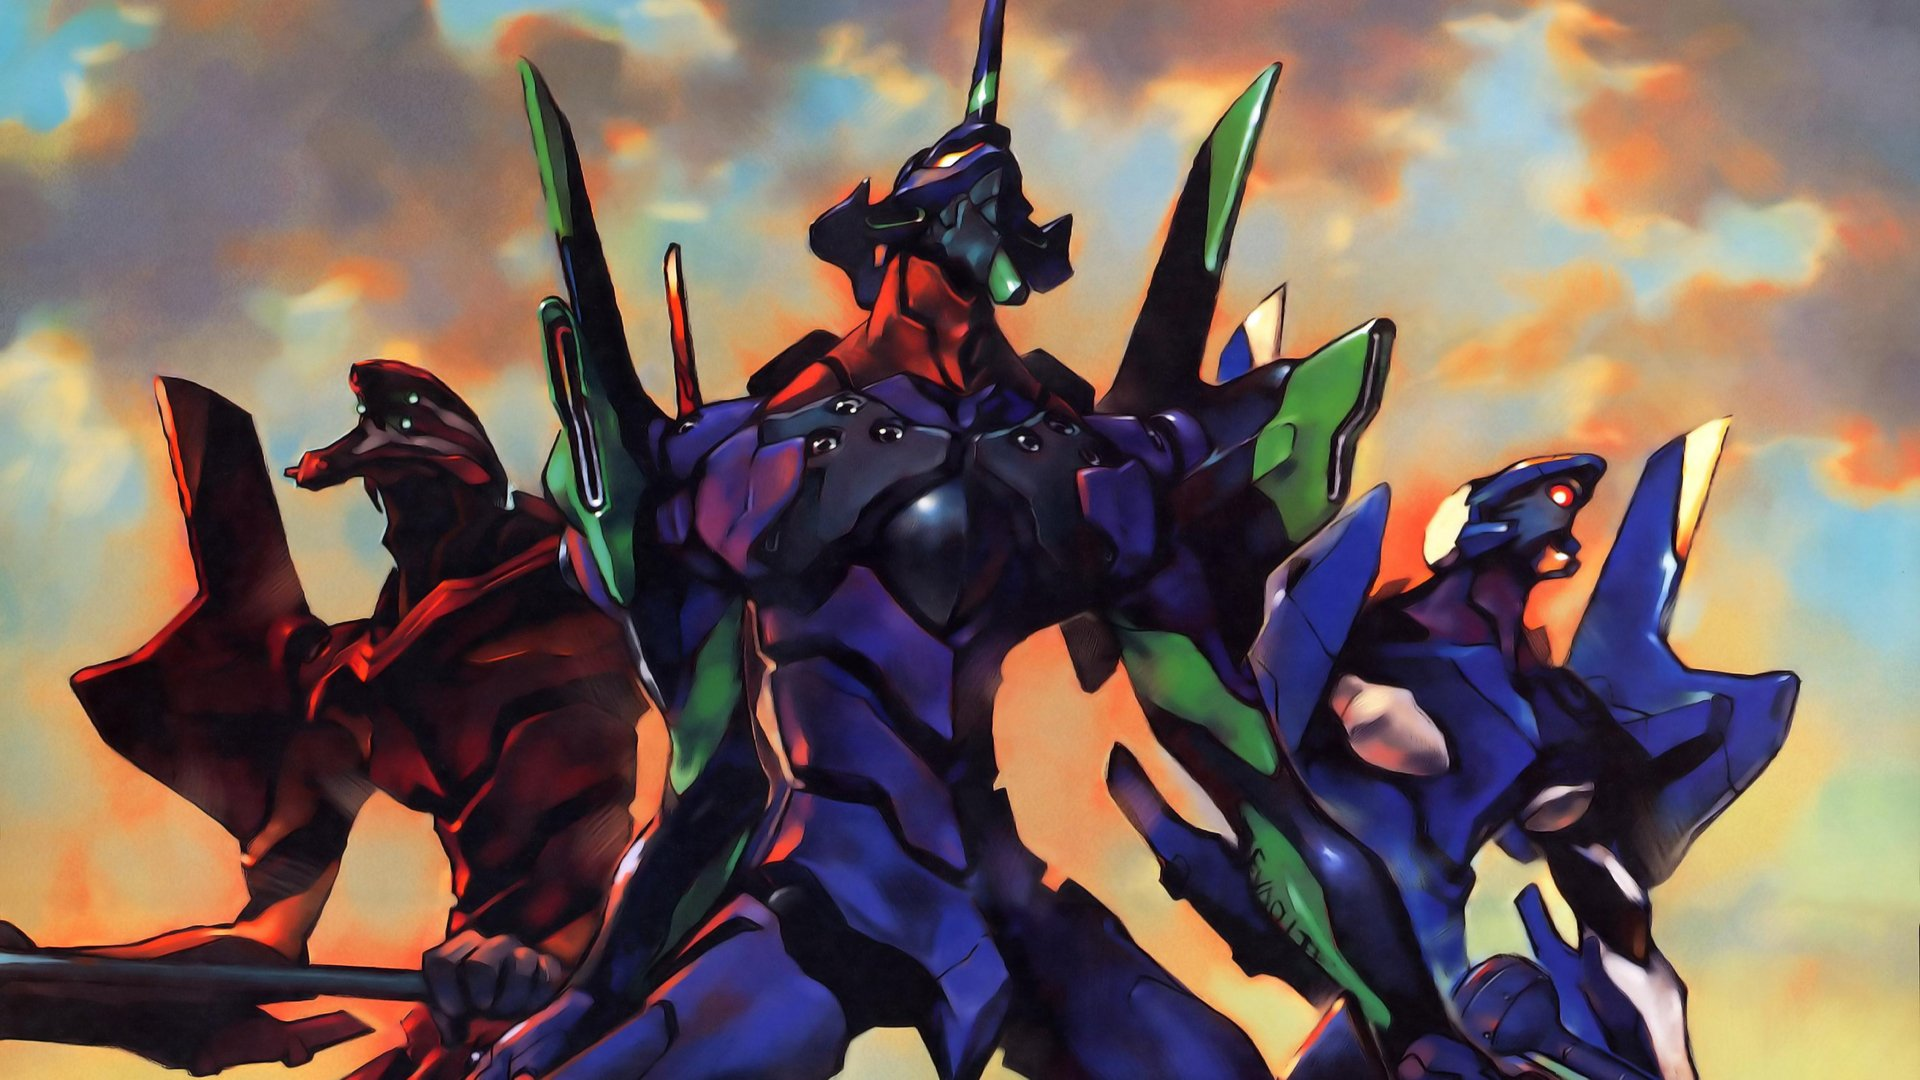 Anime - Neon Genesis Evangelion  Wallpaper